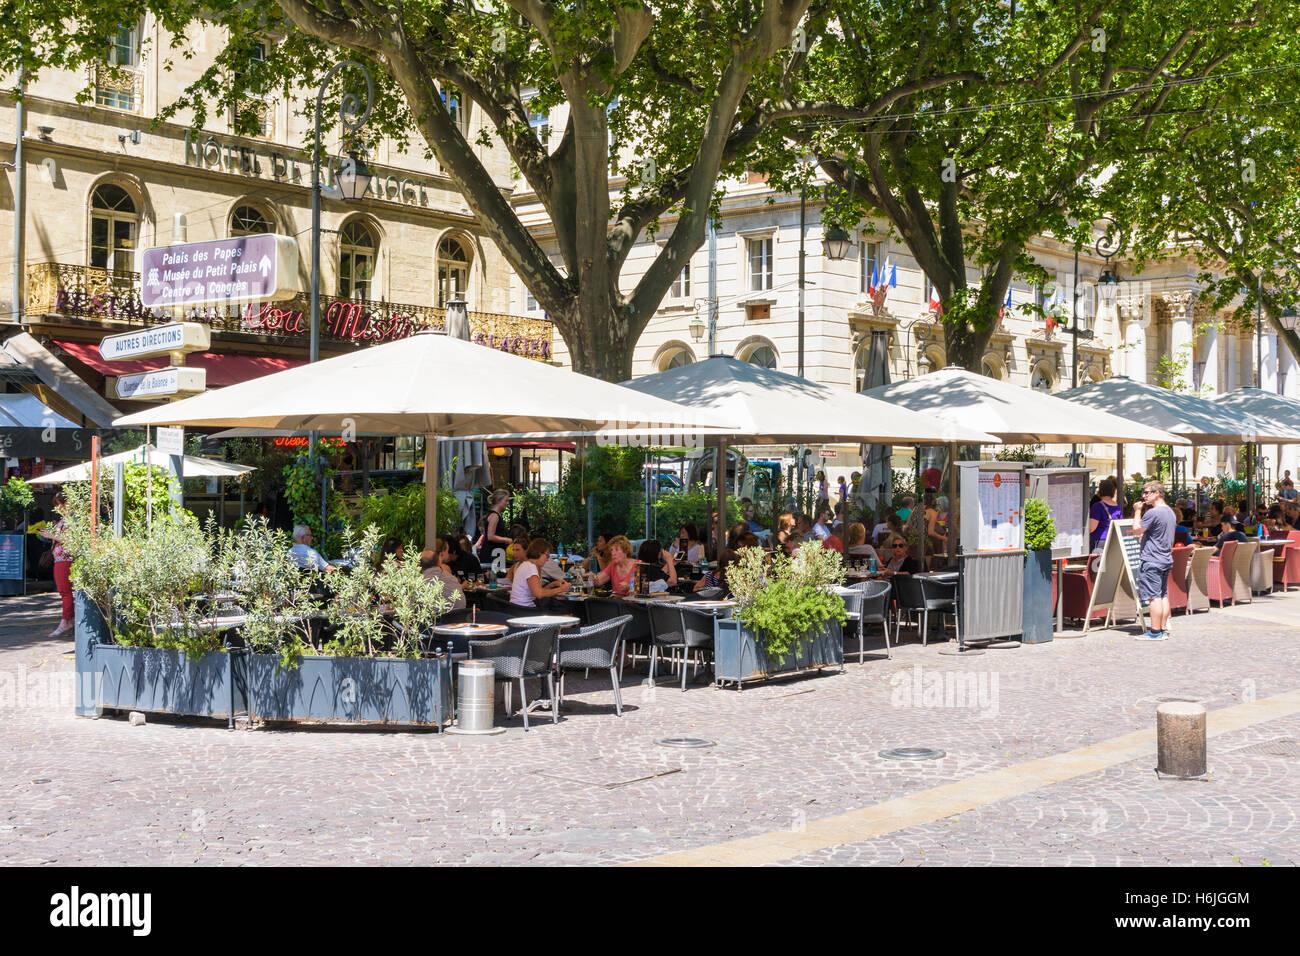 Busy Restaurants And Cafes In Place De L U0026 39 Horloge  Avignon